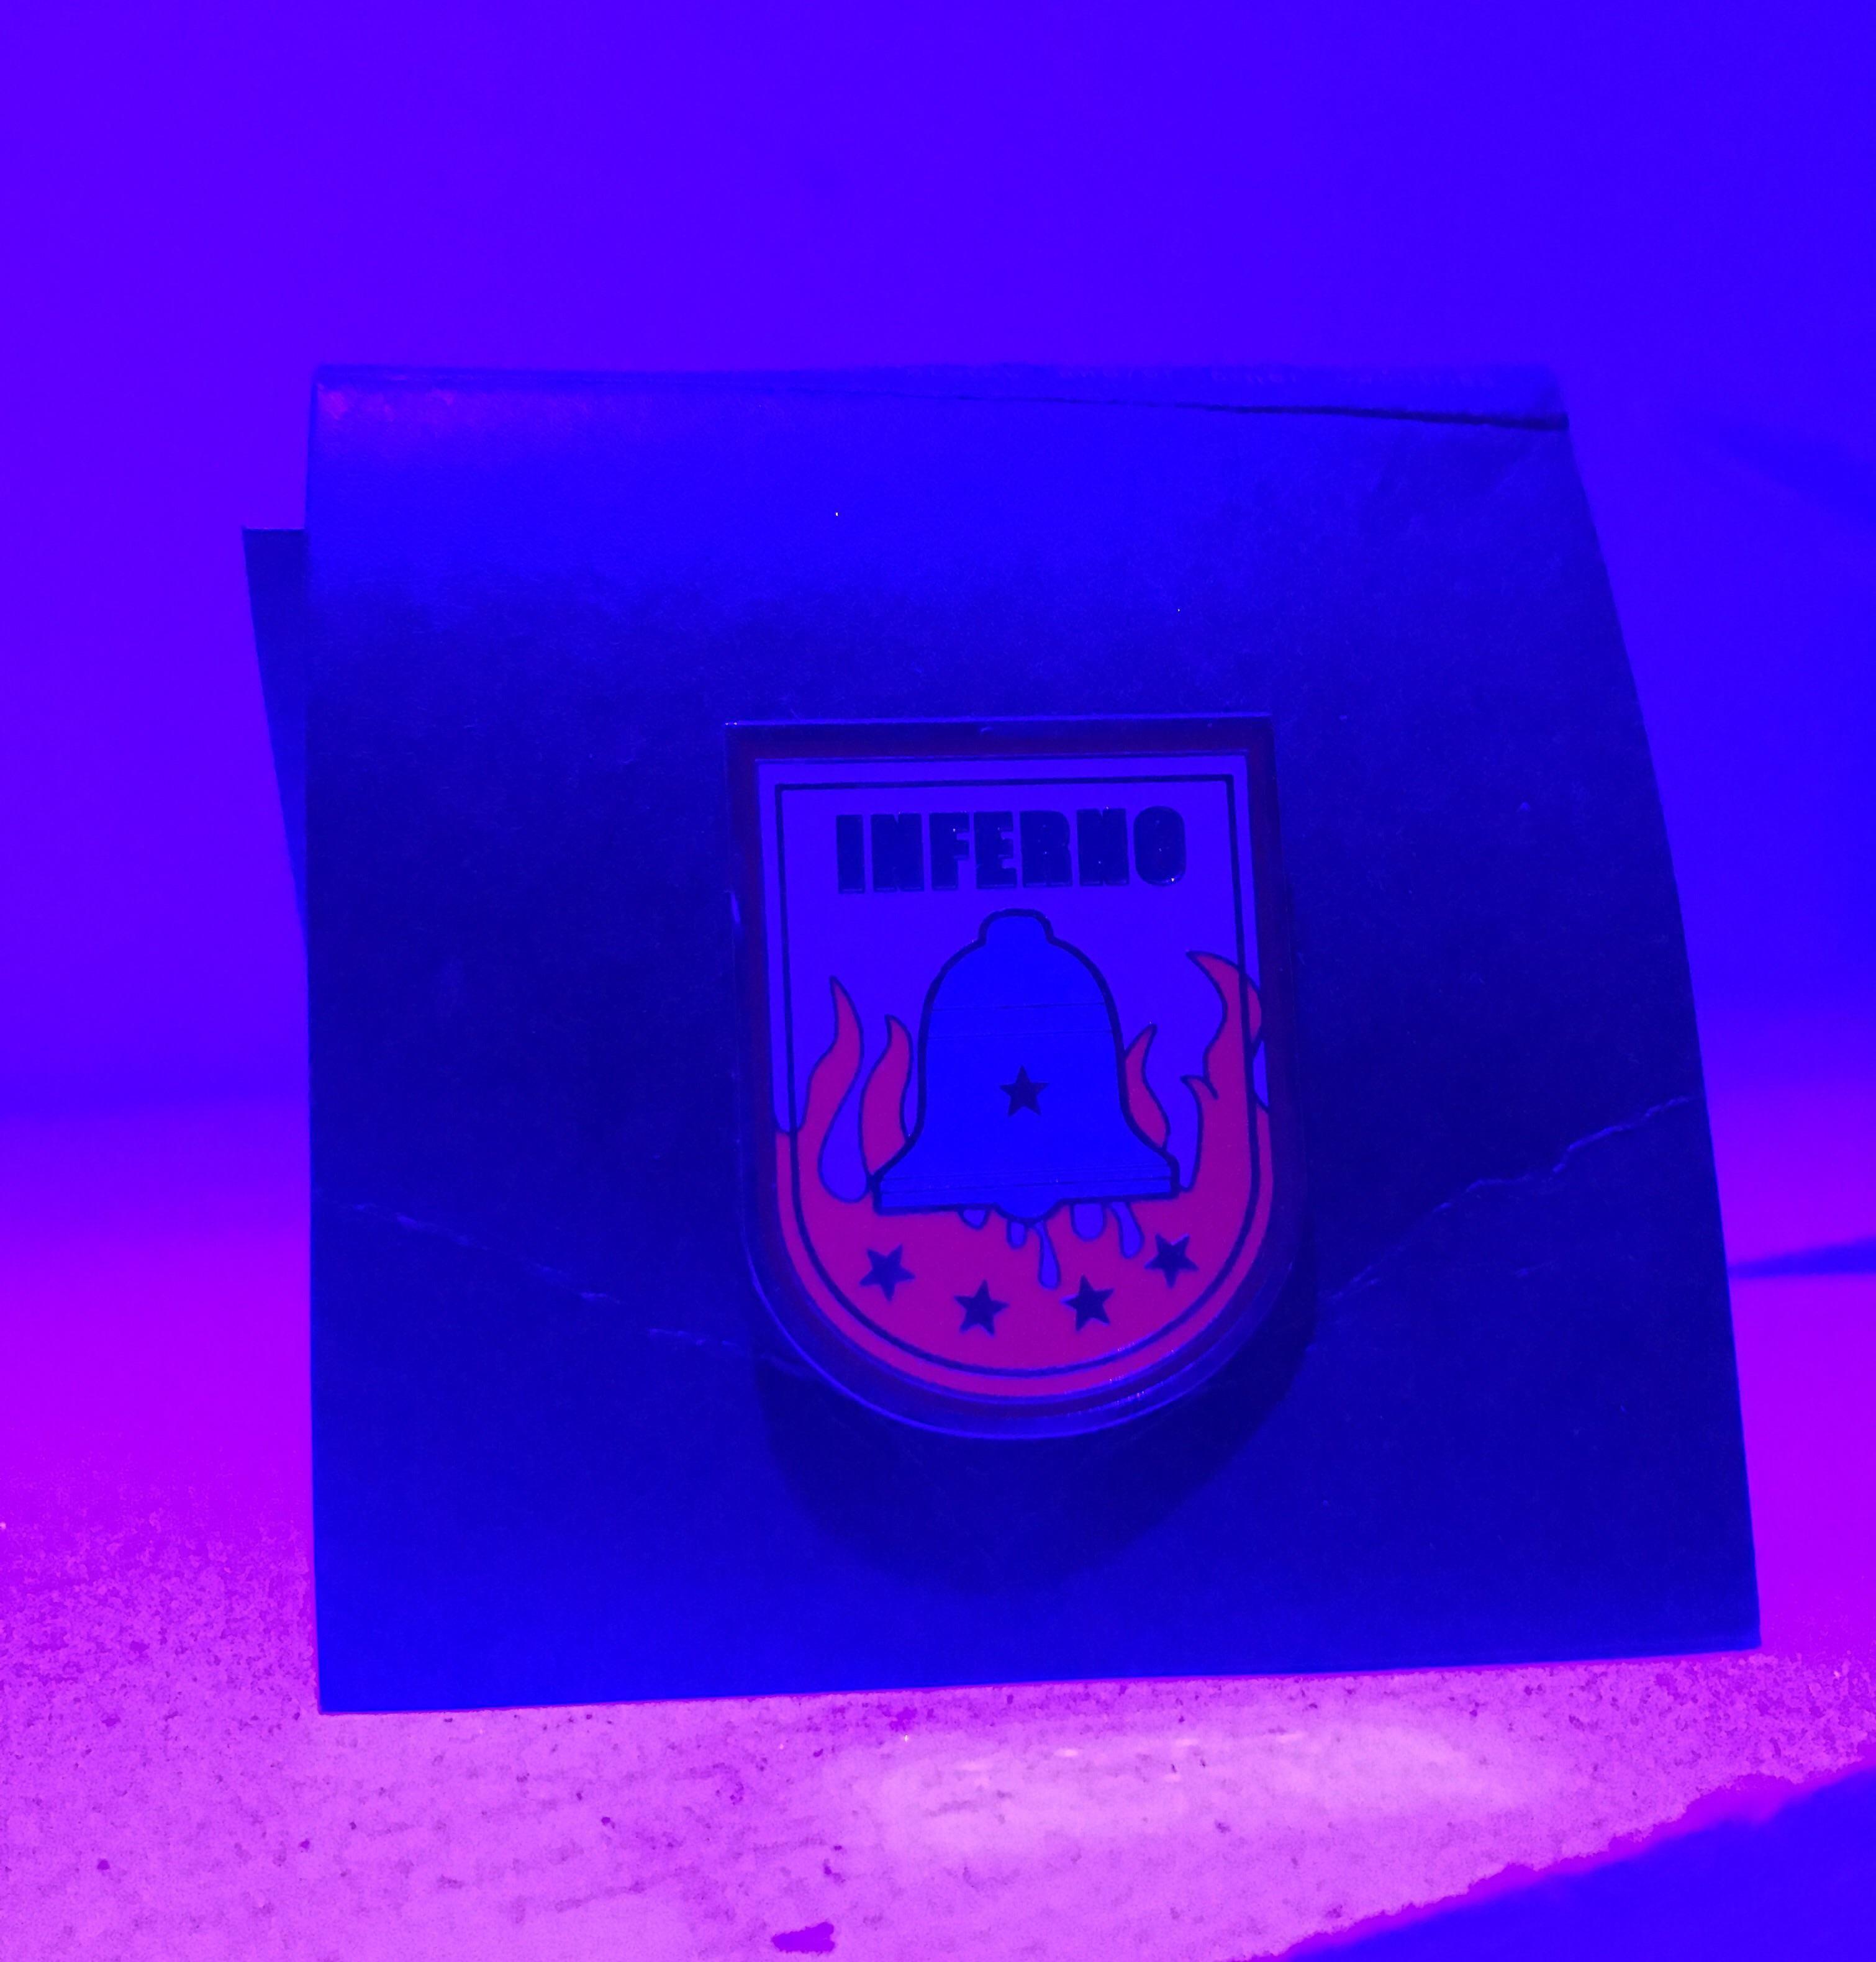 Blacklight on Inferno Pin #games #globaloffensive #CSGO #counterstrike #hltv #CS #steam #Valve #djswat #CS16